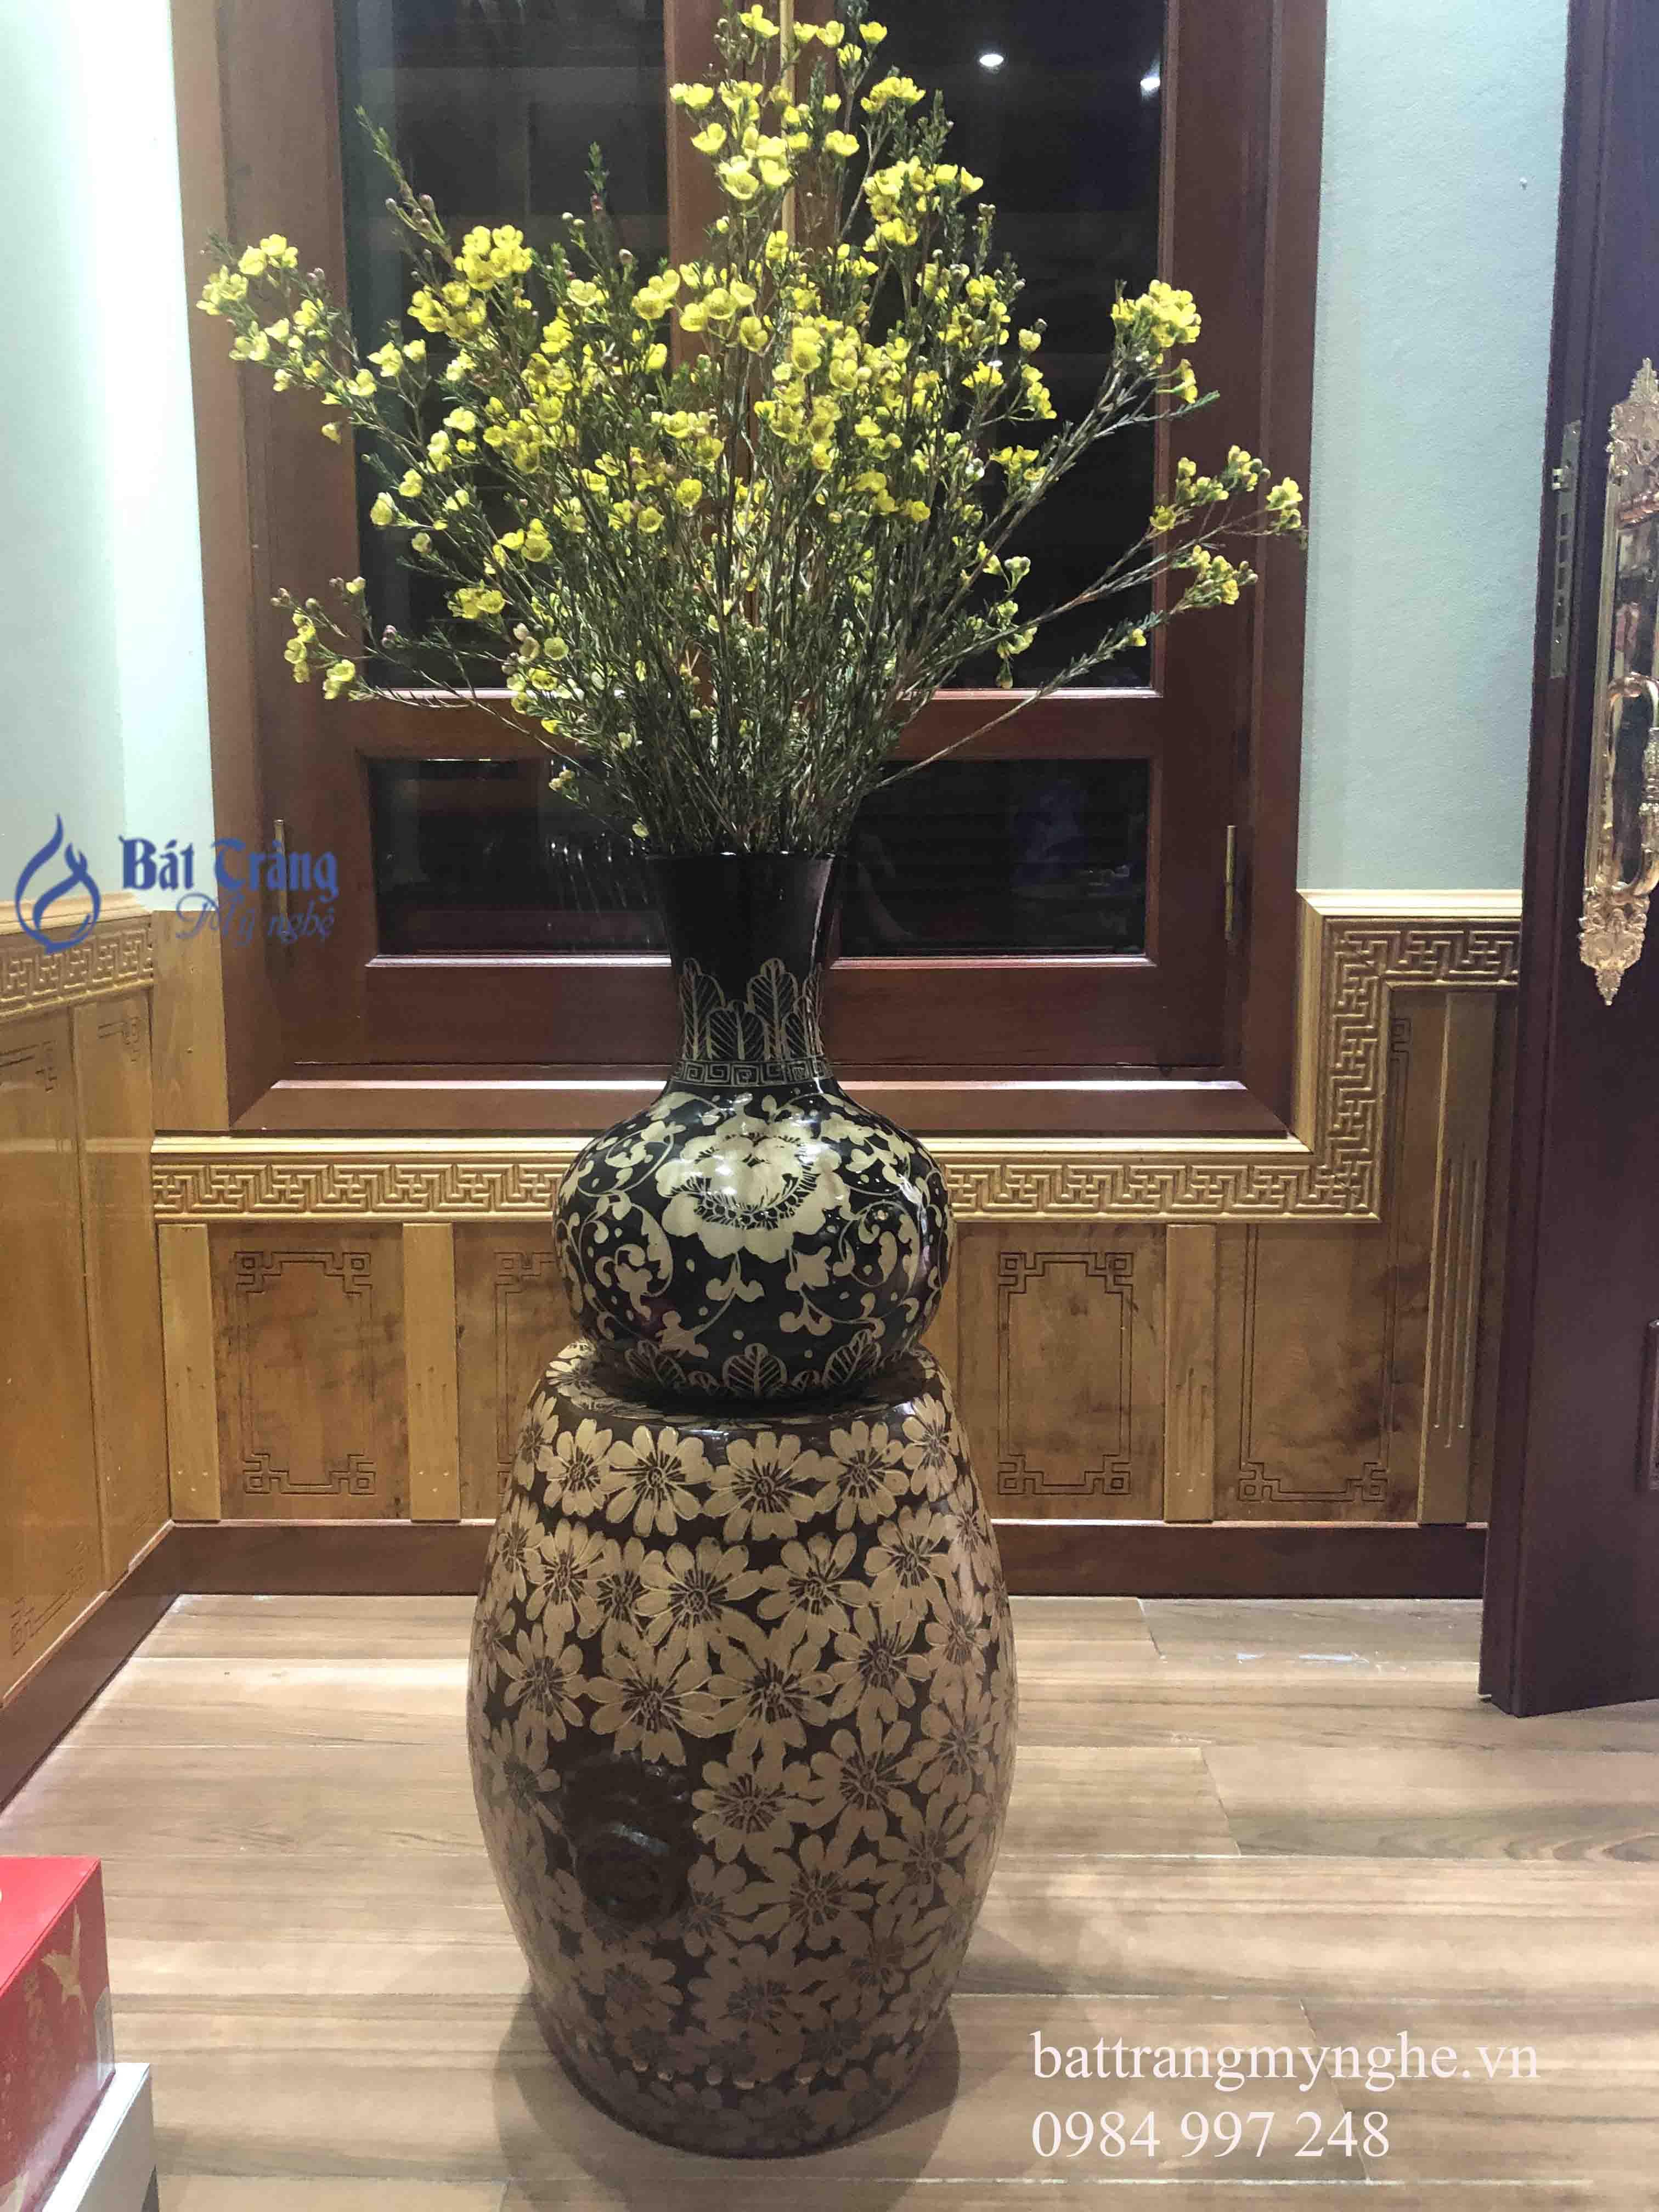 Lọ hoa dáng tỏi men nâu cao 40cm